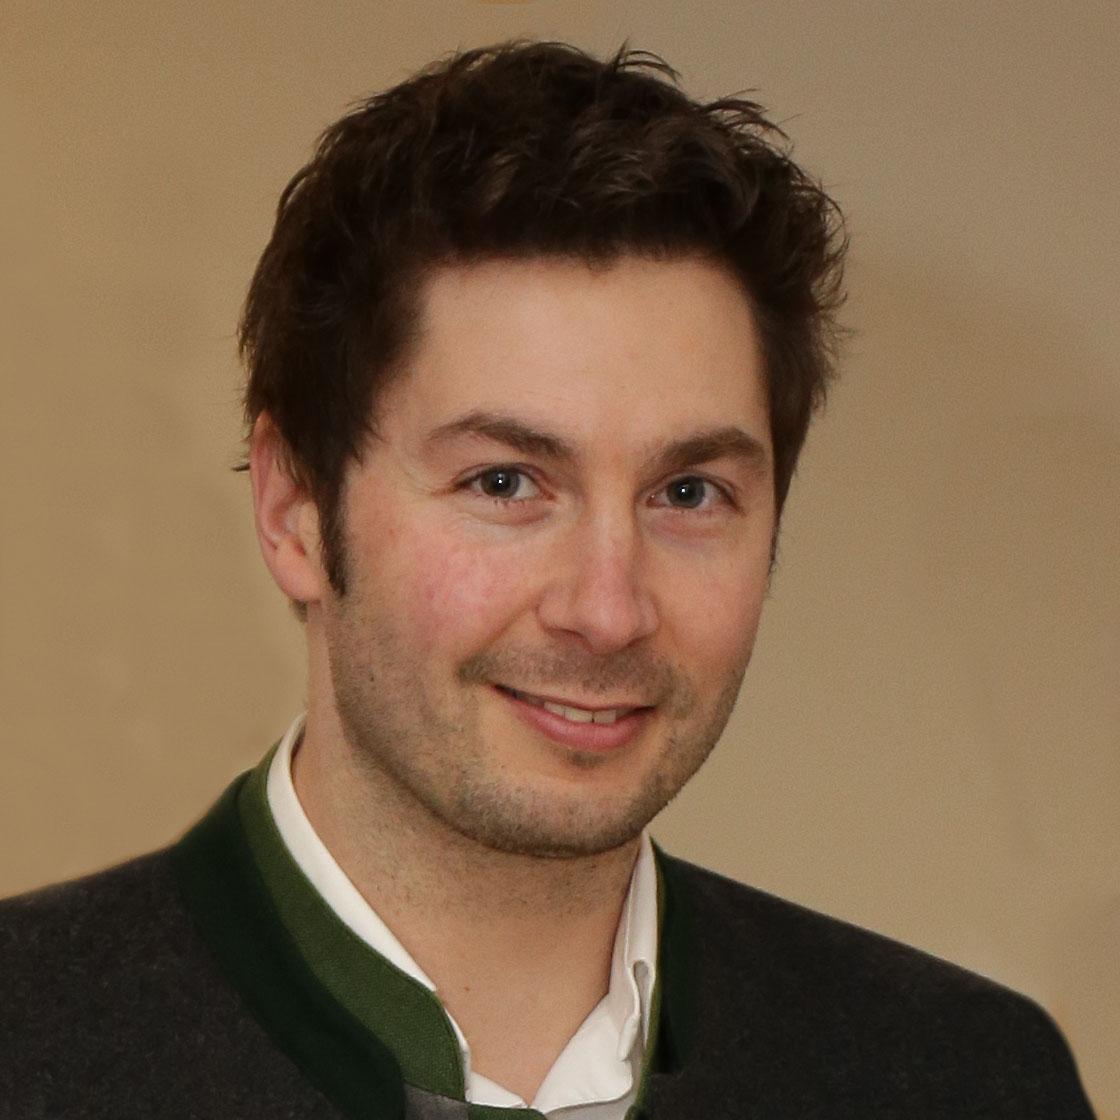 Markus Sturm